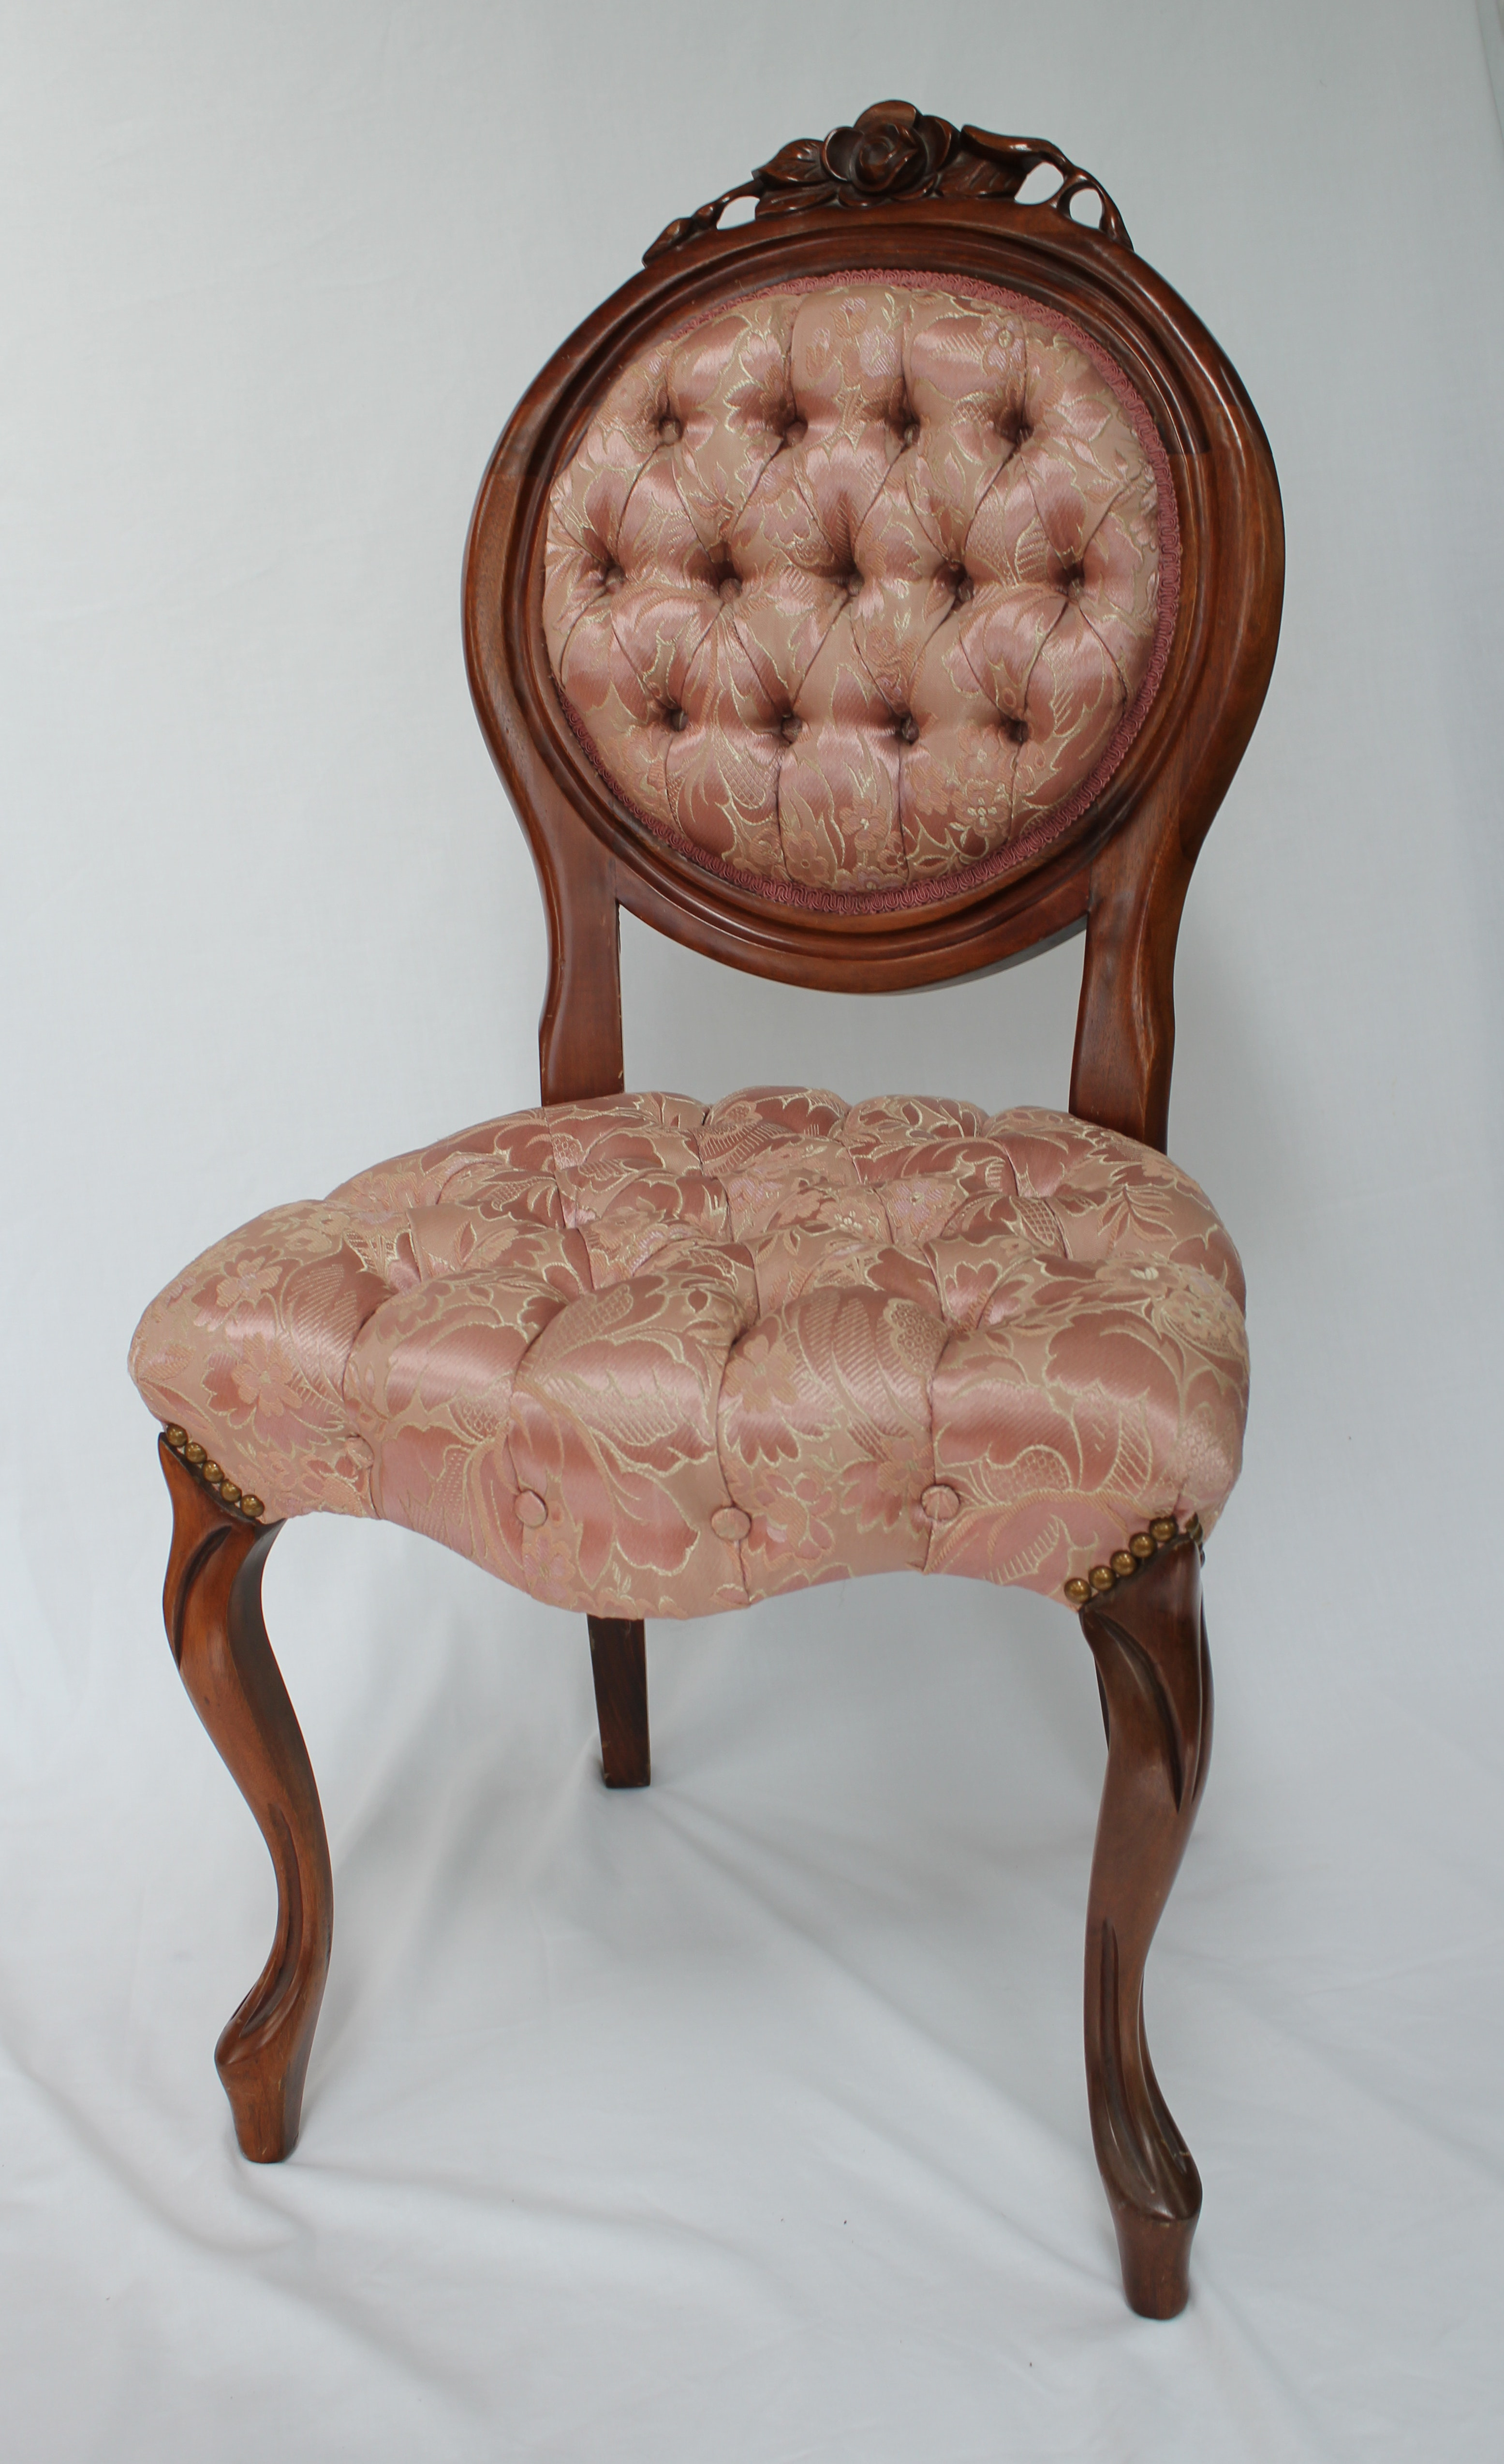 antique carlton mclendon victorian slipper chairs - Slipper Chairs